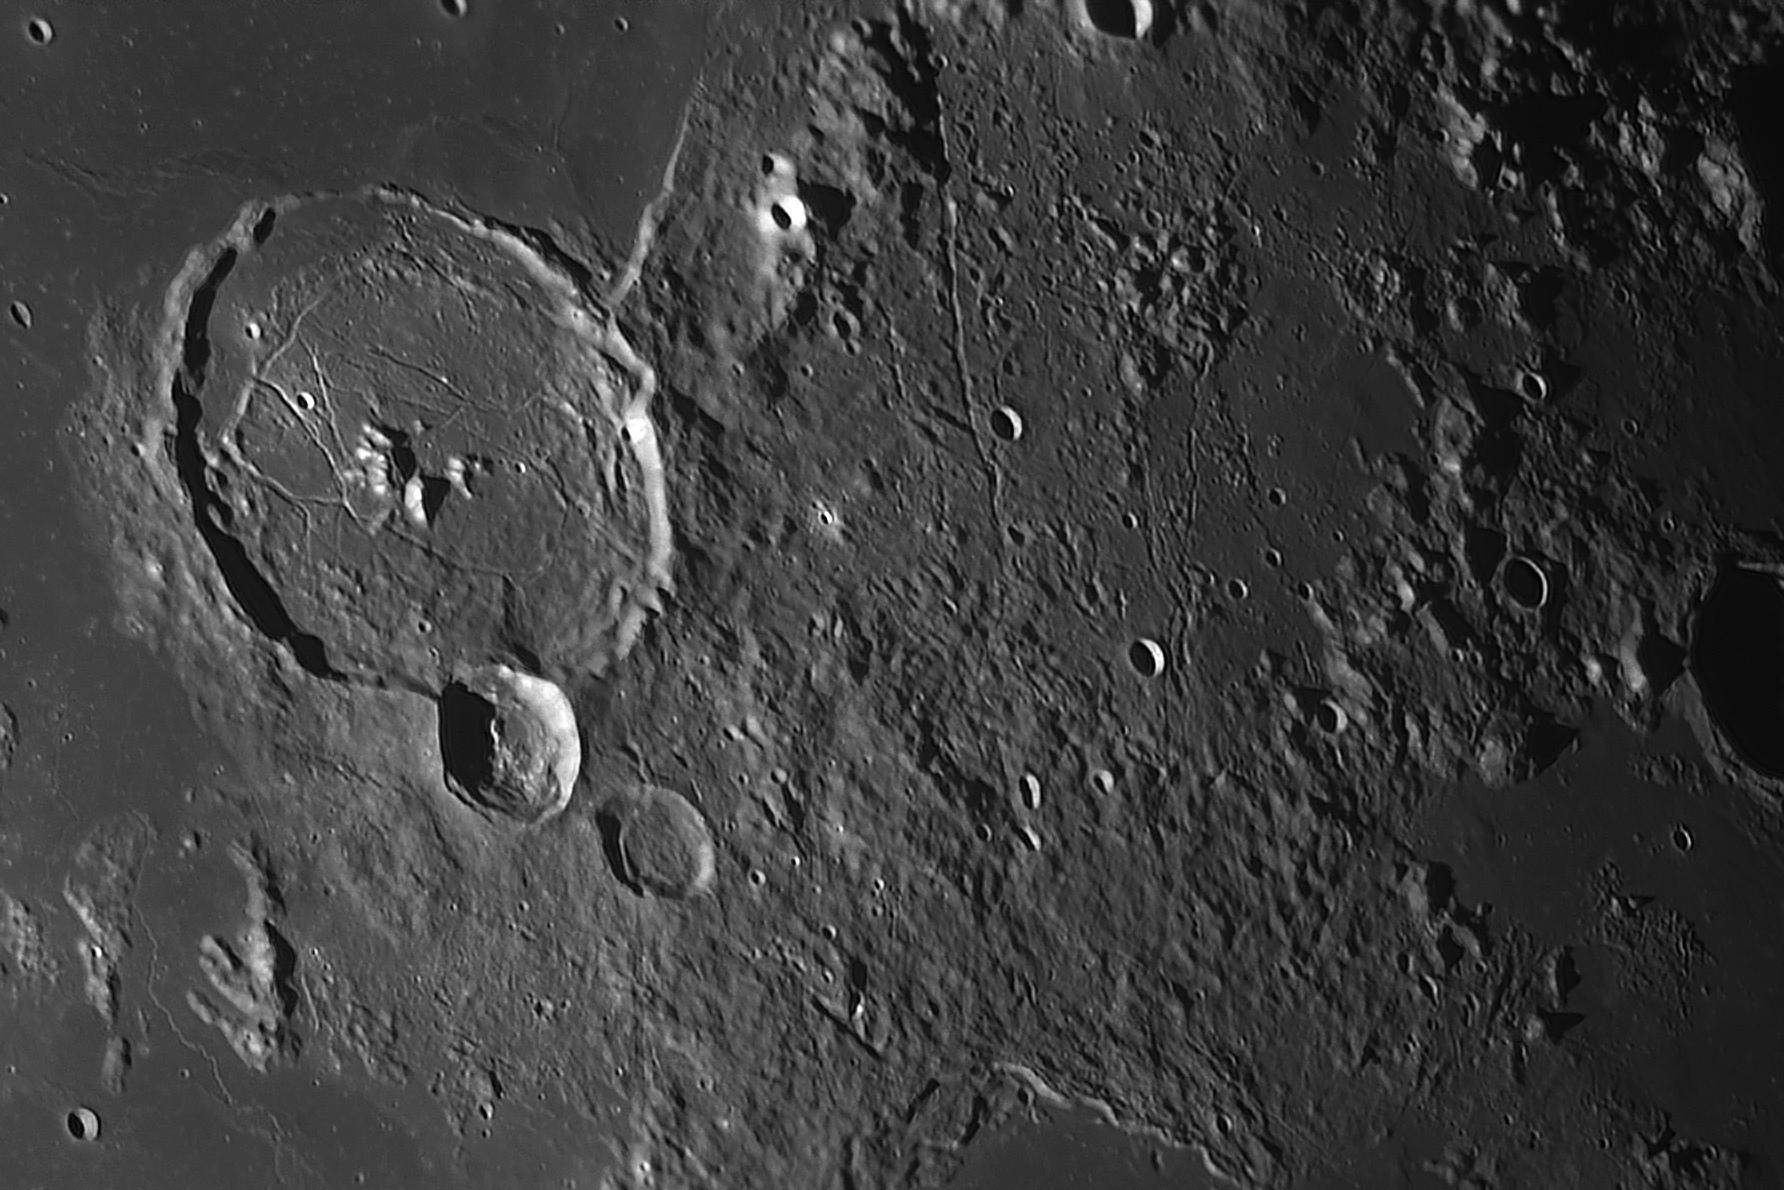 2021-02-23-2107_0-R-Moon_Gassendi_C.jpg.b3b84696085939409d0df527dcb40300.jpg